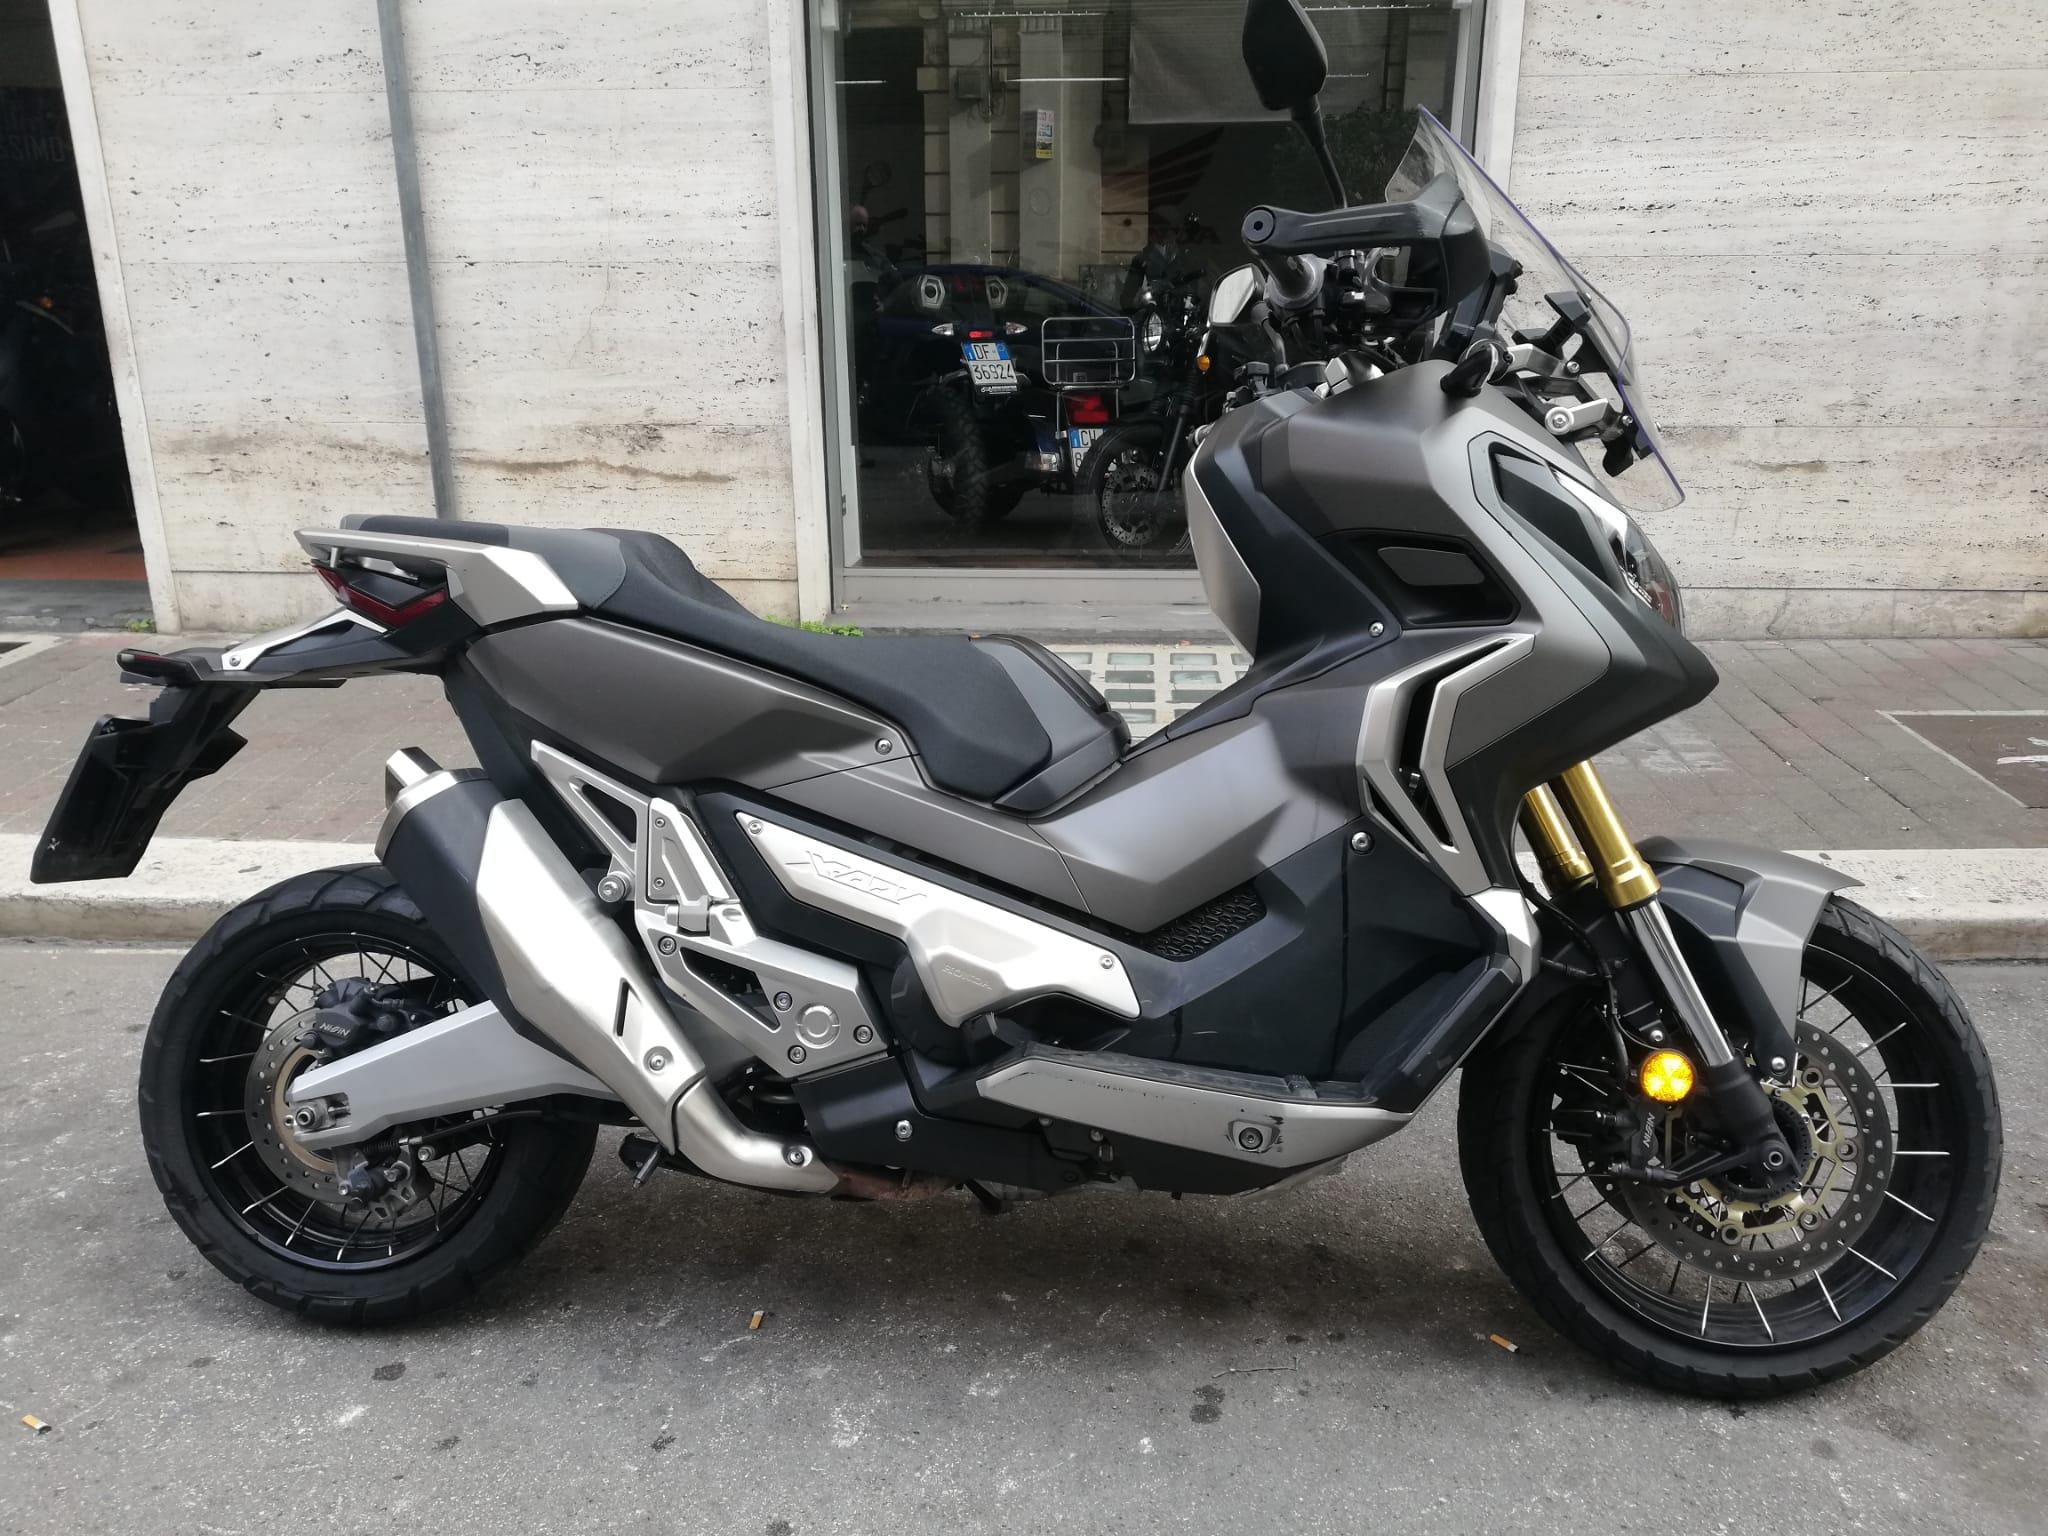 HONDA X-ADV 2018 750 cm3 | scooter | 11 200 km | Argent